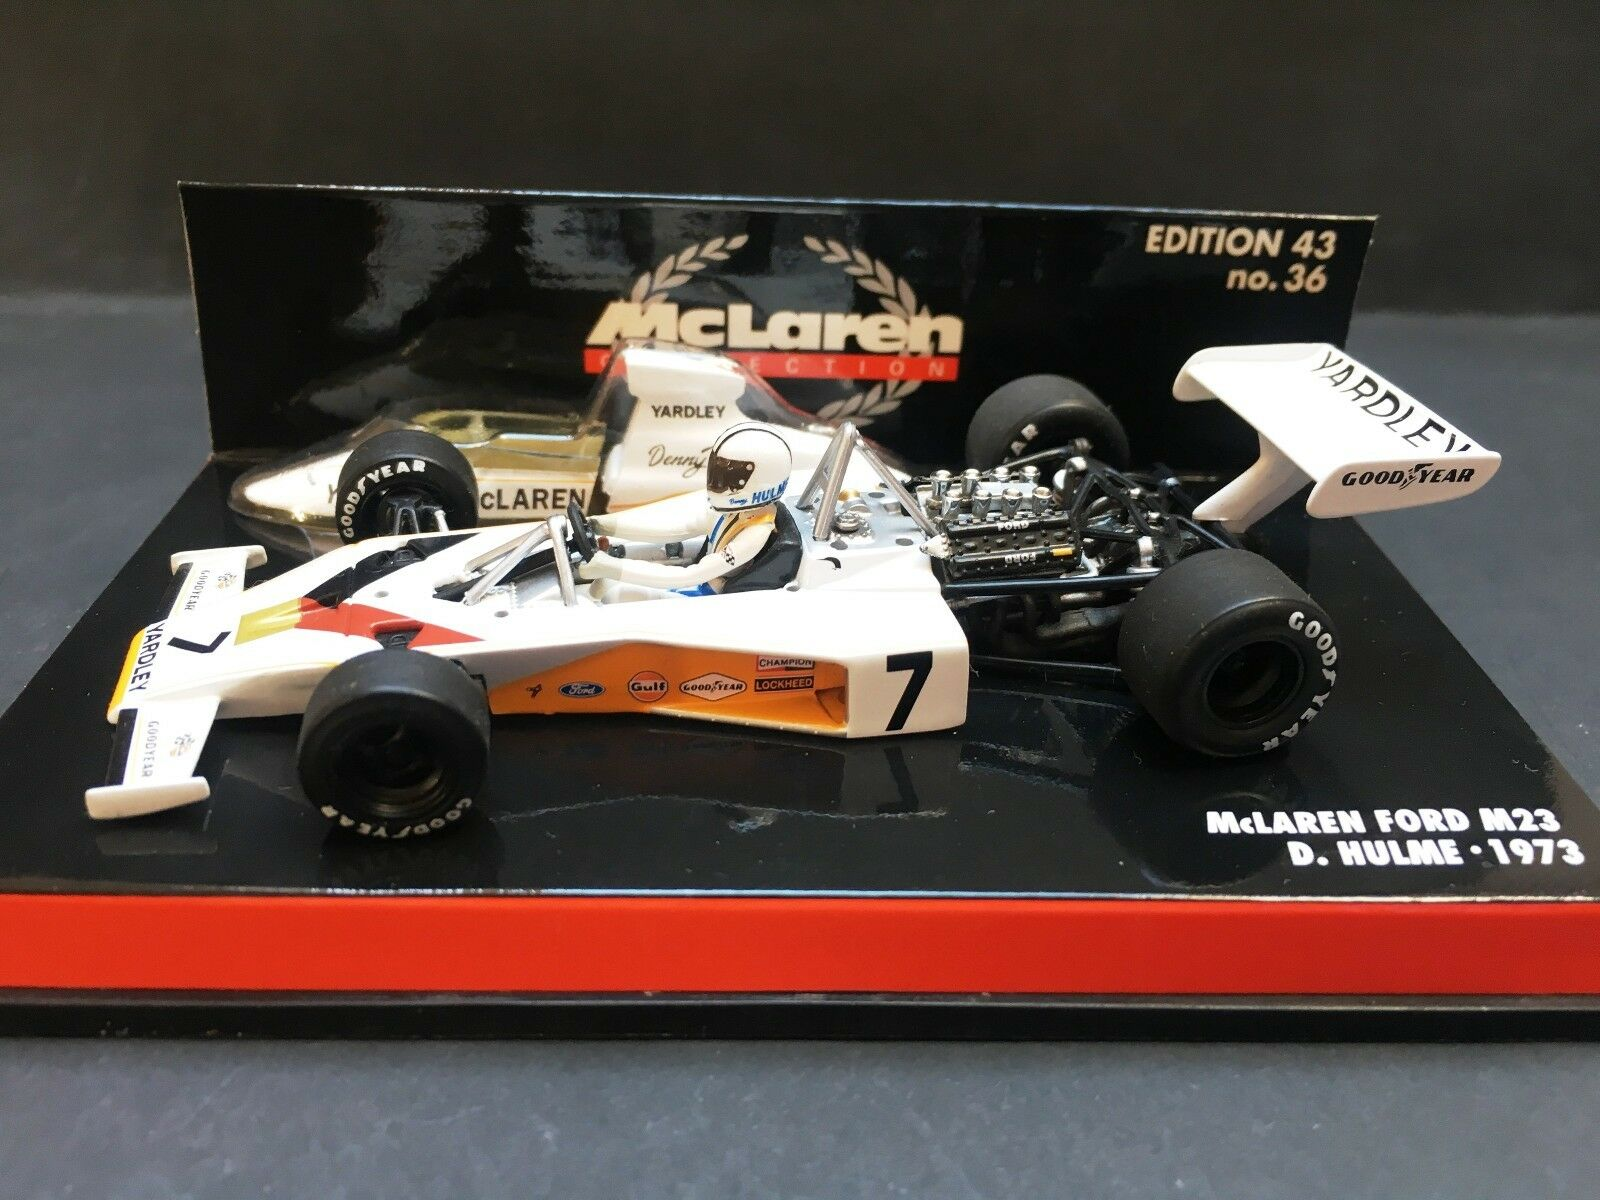 Minichamps - Denny Hulme - McLaren - M23 - 1973 -1 43 - Yardley - Rare